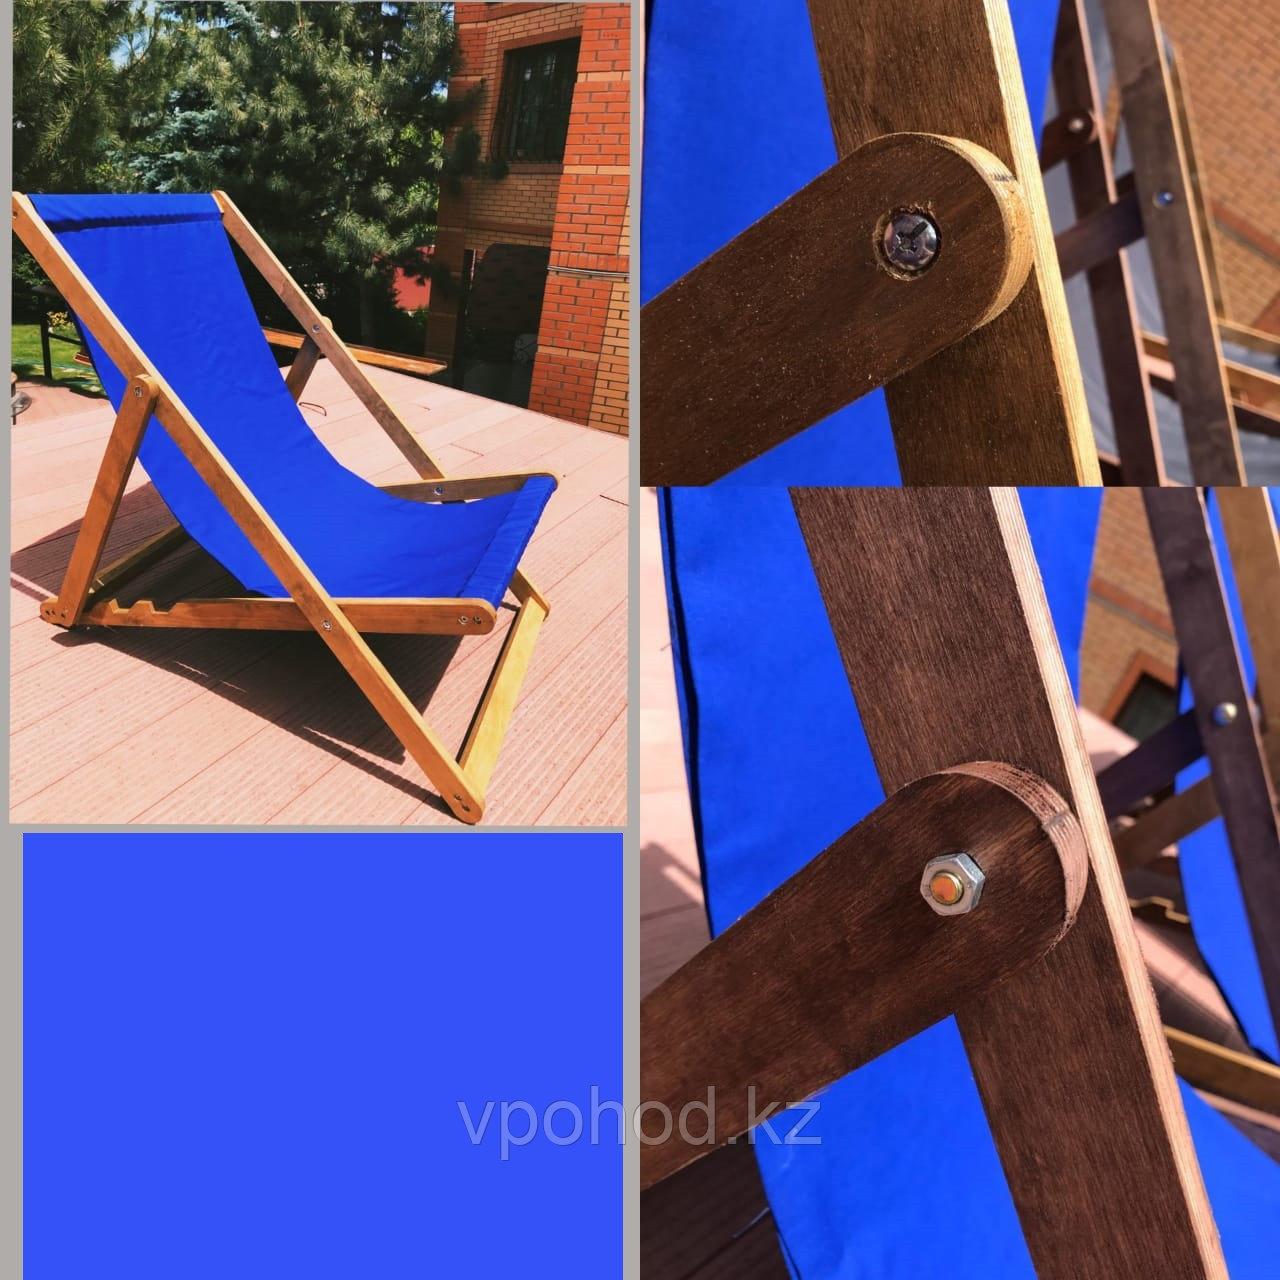 Шезлонг деревянный синий